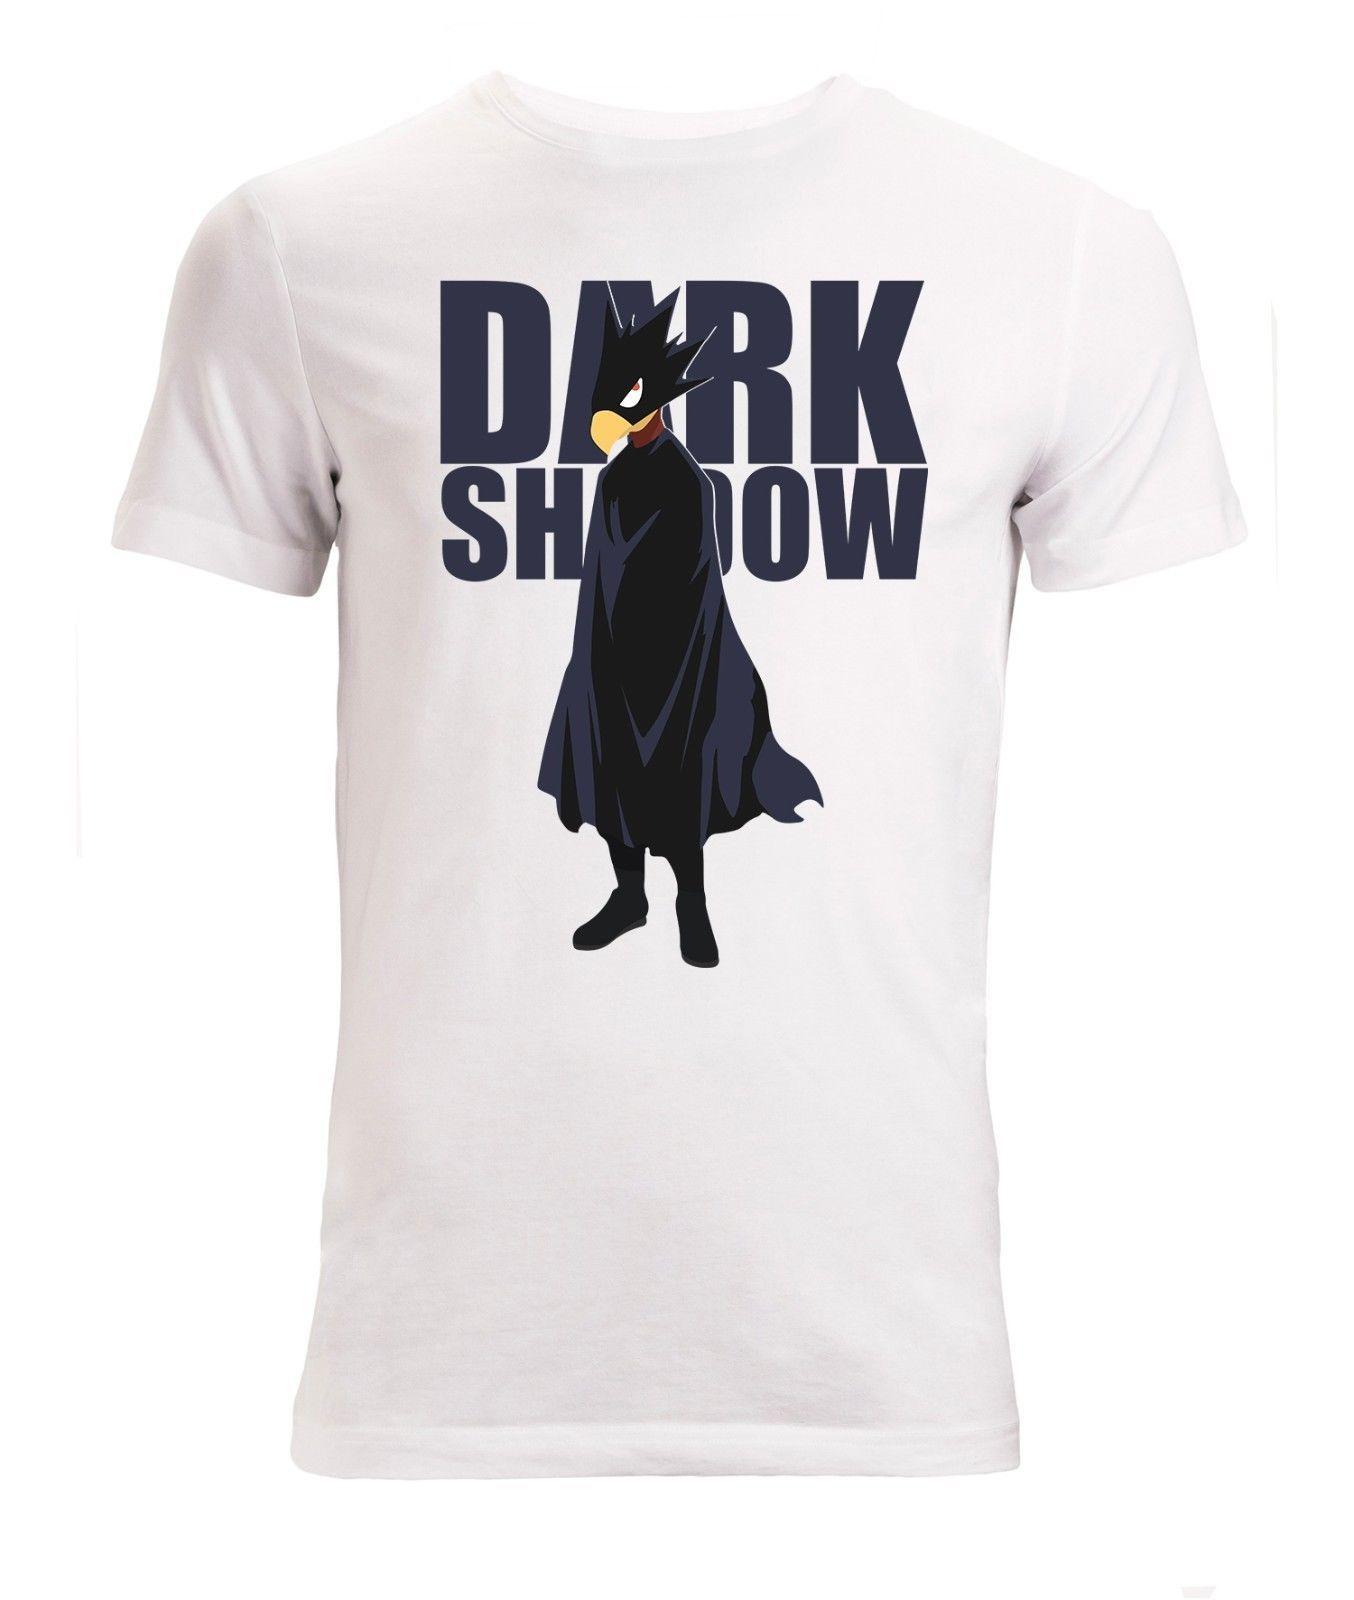 d547b3eb496 My Hero Academia Tokoyami Dark Shadow Men S Woman S Available T Shirt White  Cool T Shirt Online T Shirt 24 Hours From Activitytshirt